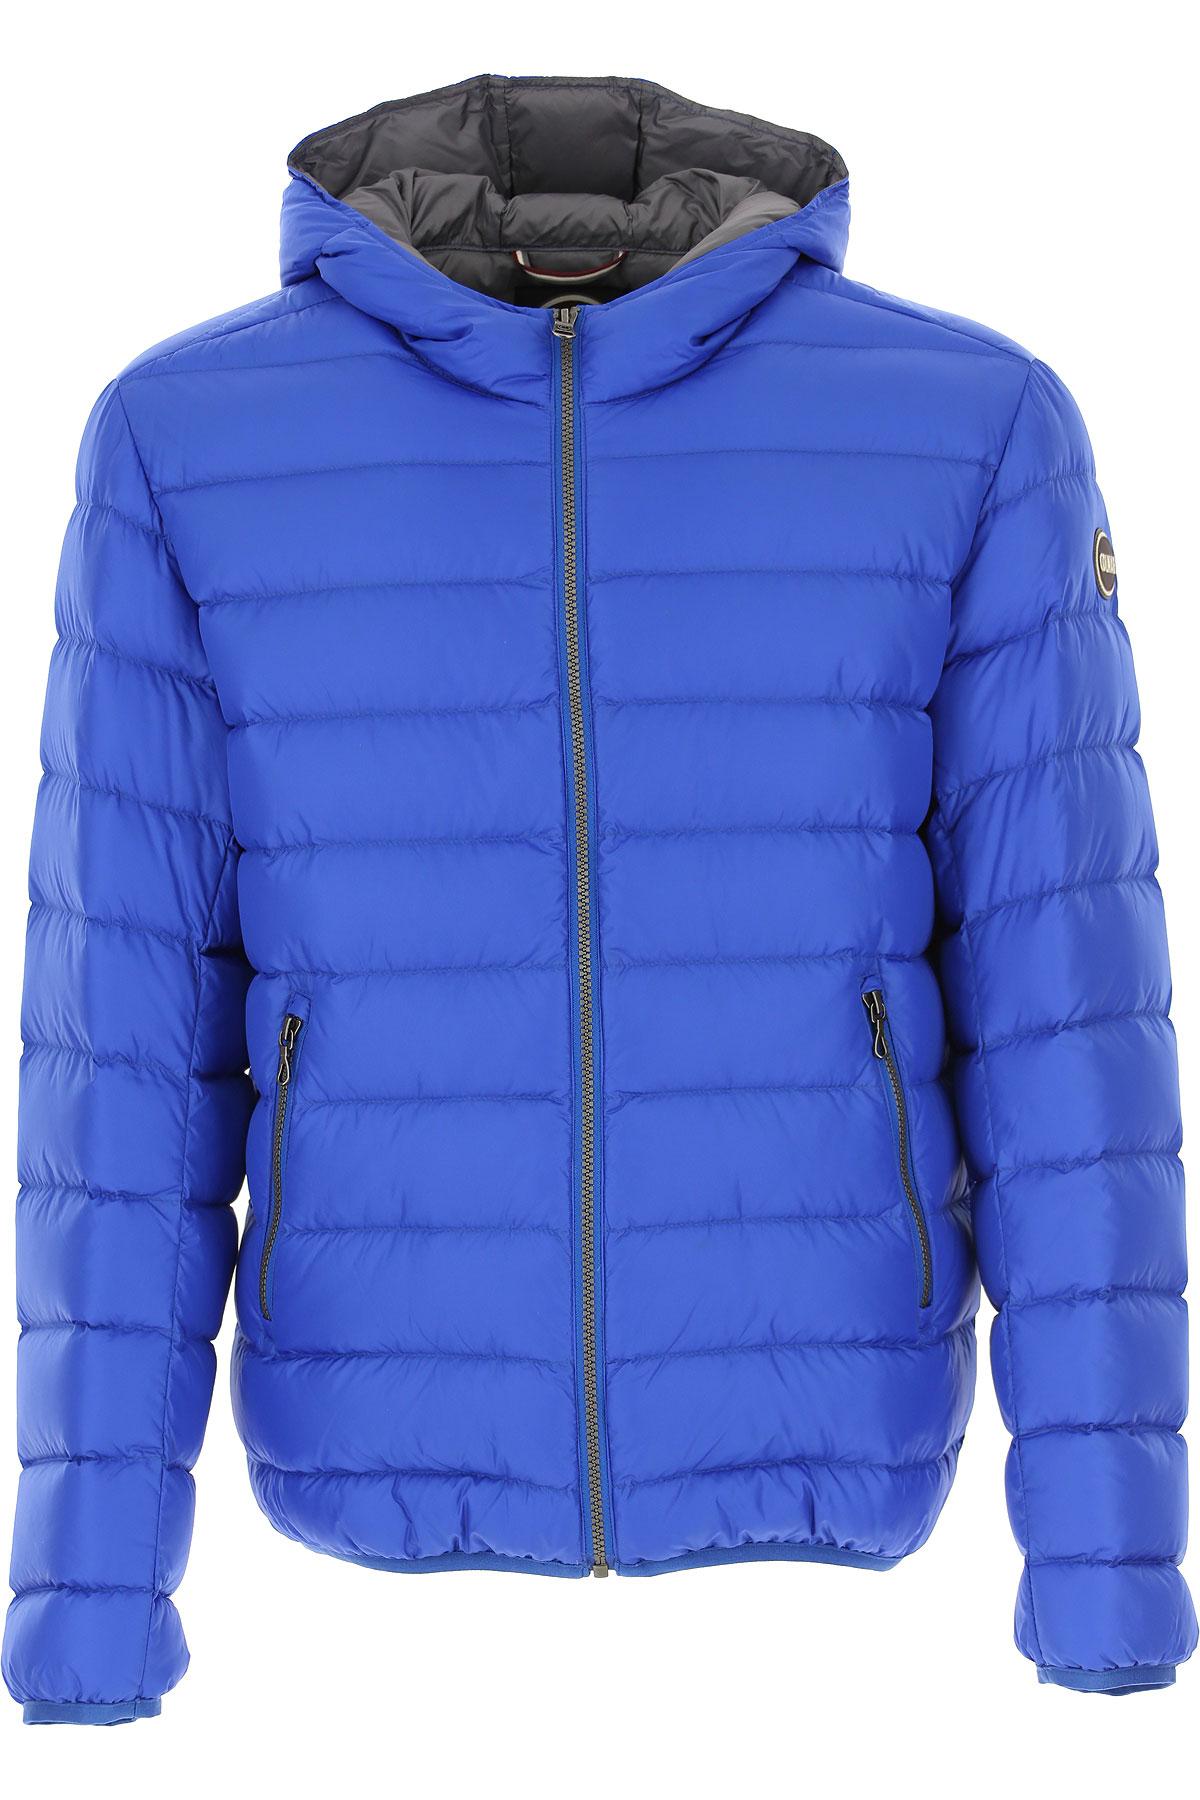 Colmar Down Jacket for Men, Puffer Ski Jacket, Abyss Blue, polyamide, 2019, XL XXL